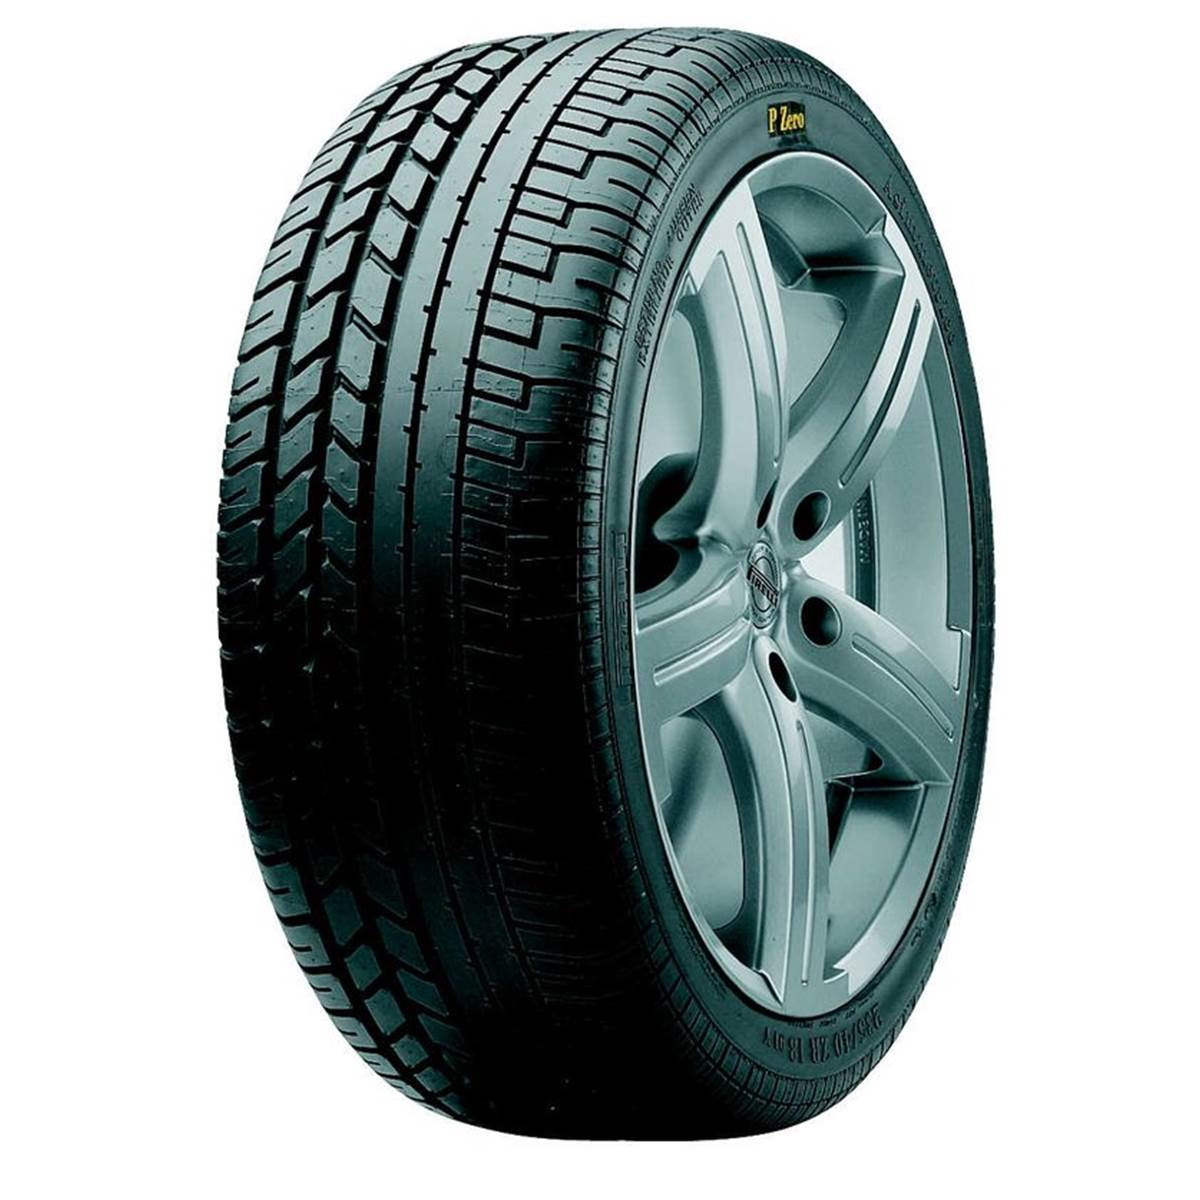 Pneu Pirelli 255/40R19 96Y Pzero Asimmetrico